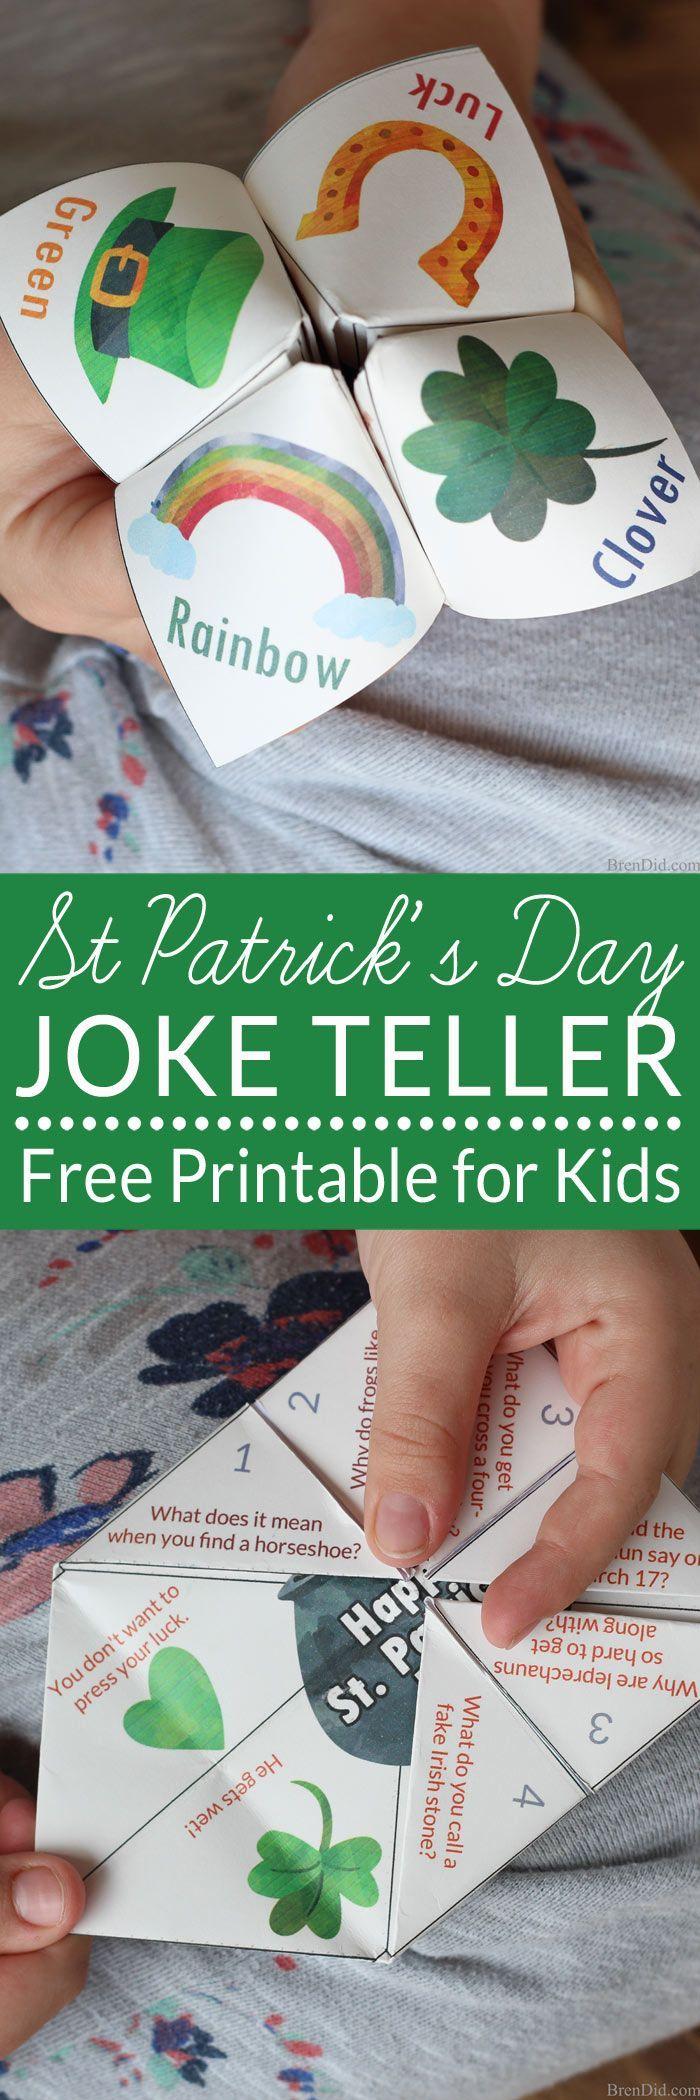 A joke teller is a great St. Patrick's Day treat for kids.